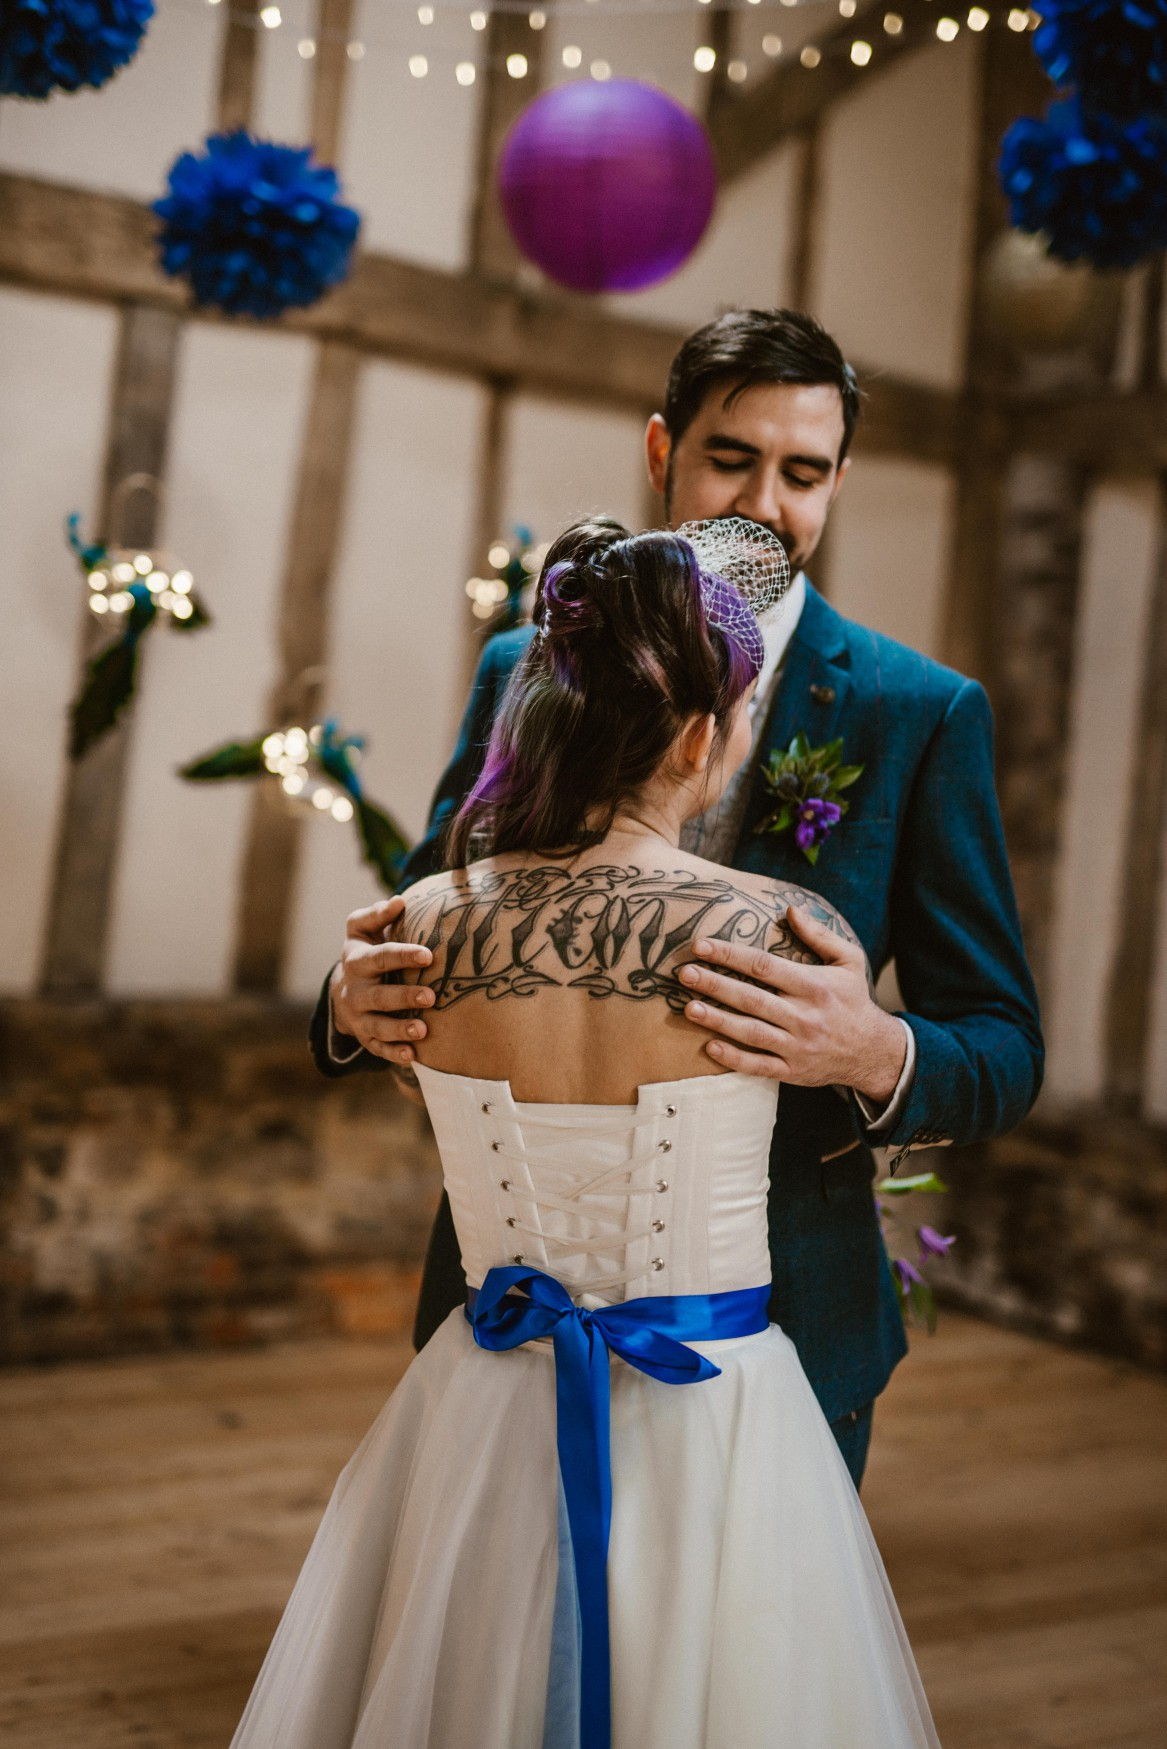 Peacock barns - alternative unconventional wedding photoshoot - rustic decadent - first dance - tattooed bride